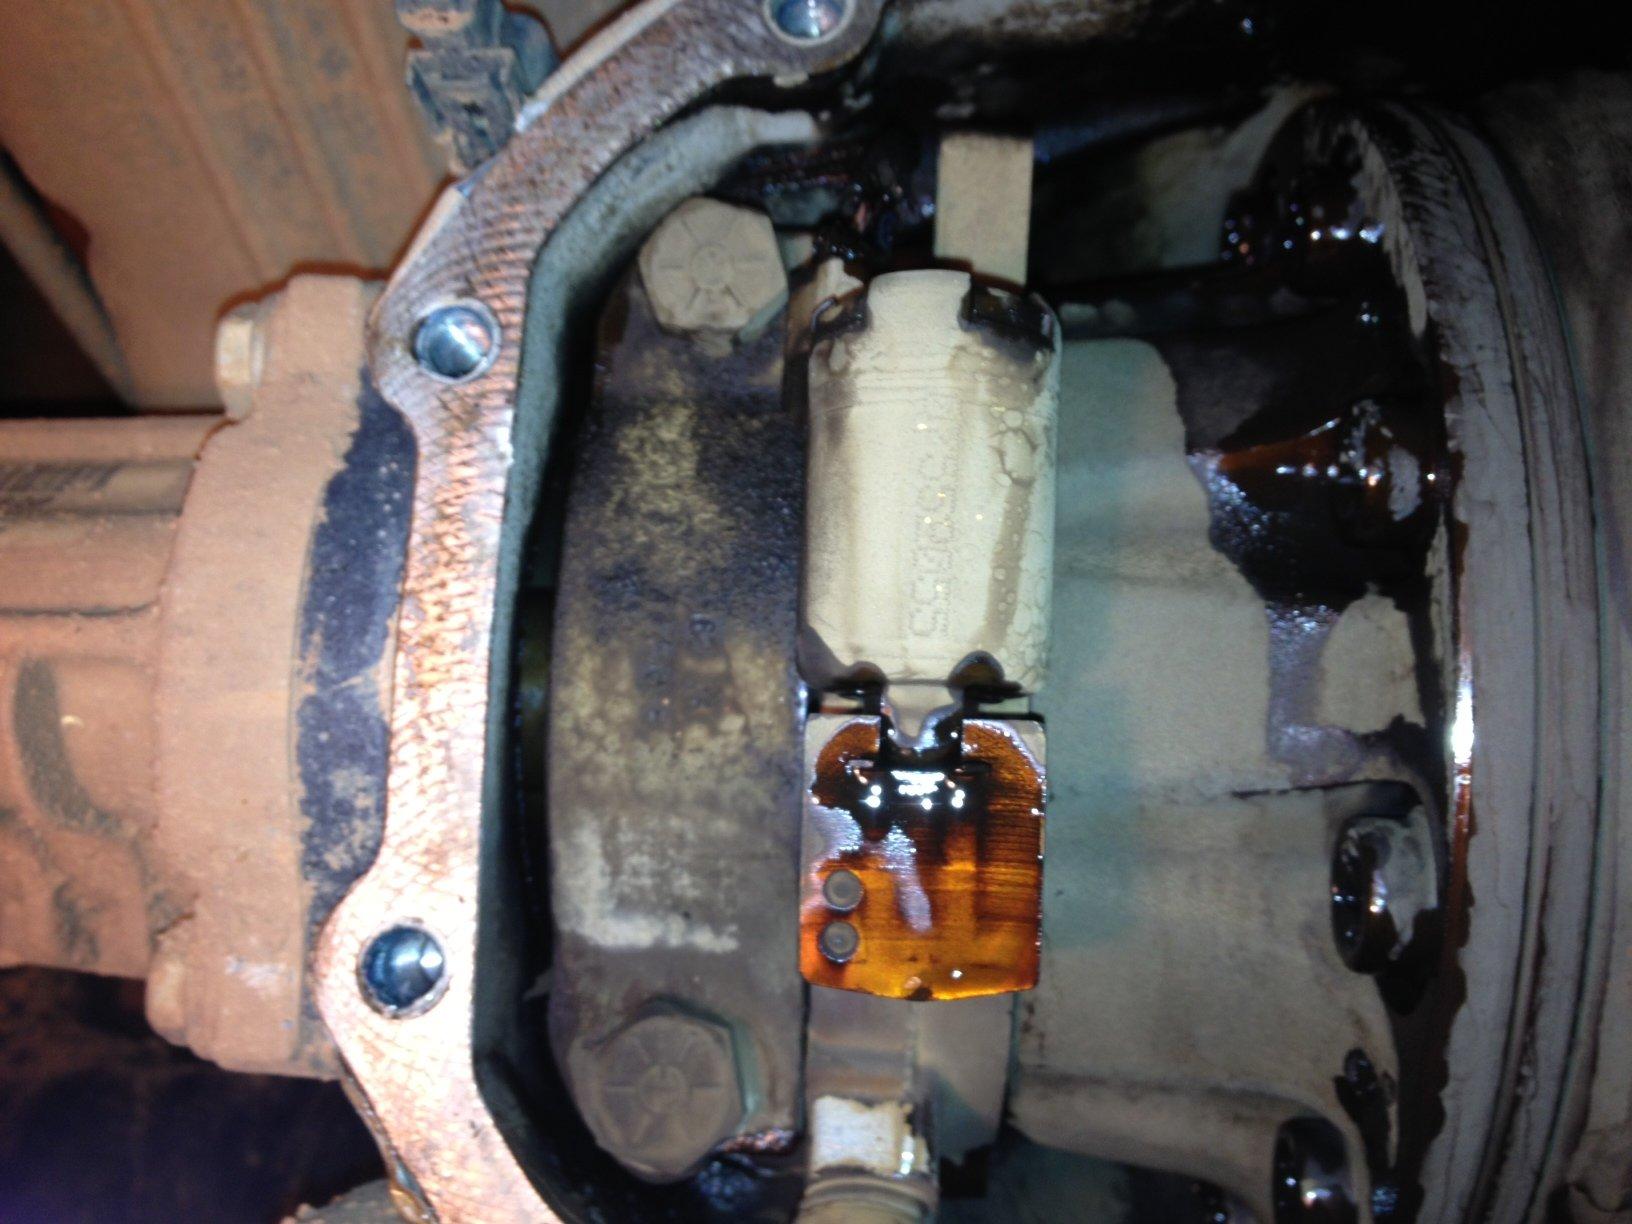 2013-02-05_213837_elsd  Chevy Trailblazer Engine Wiring Harness on